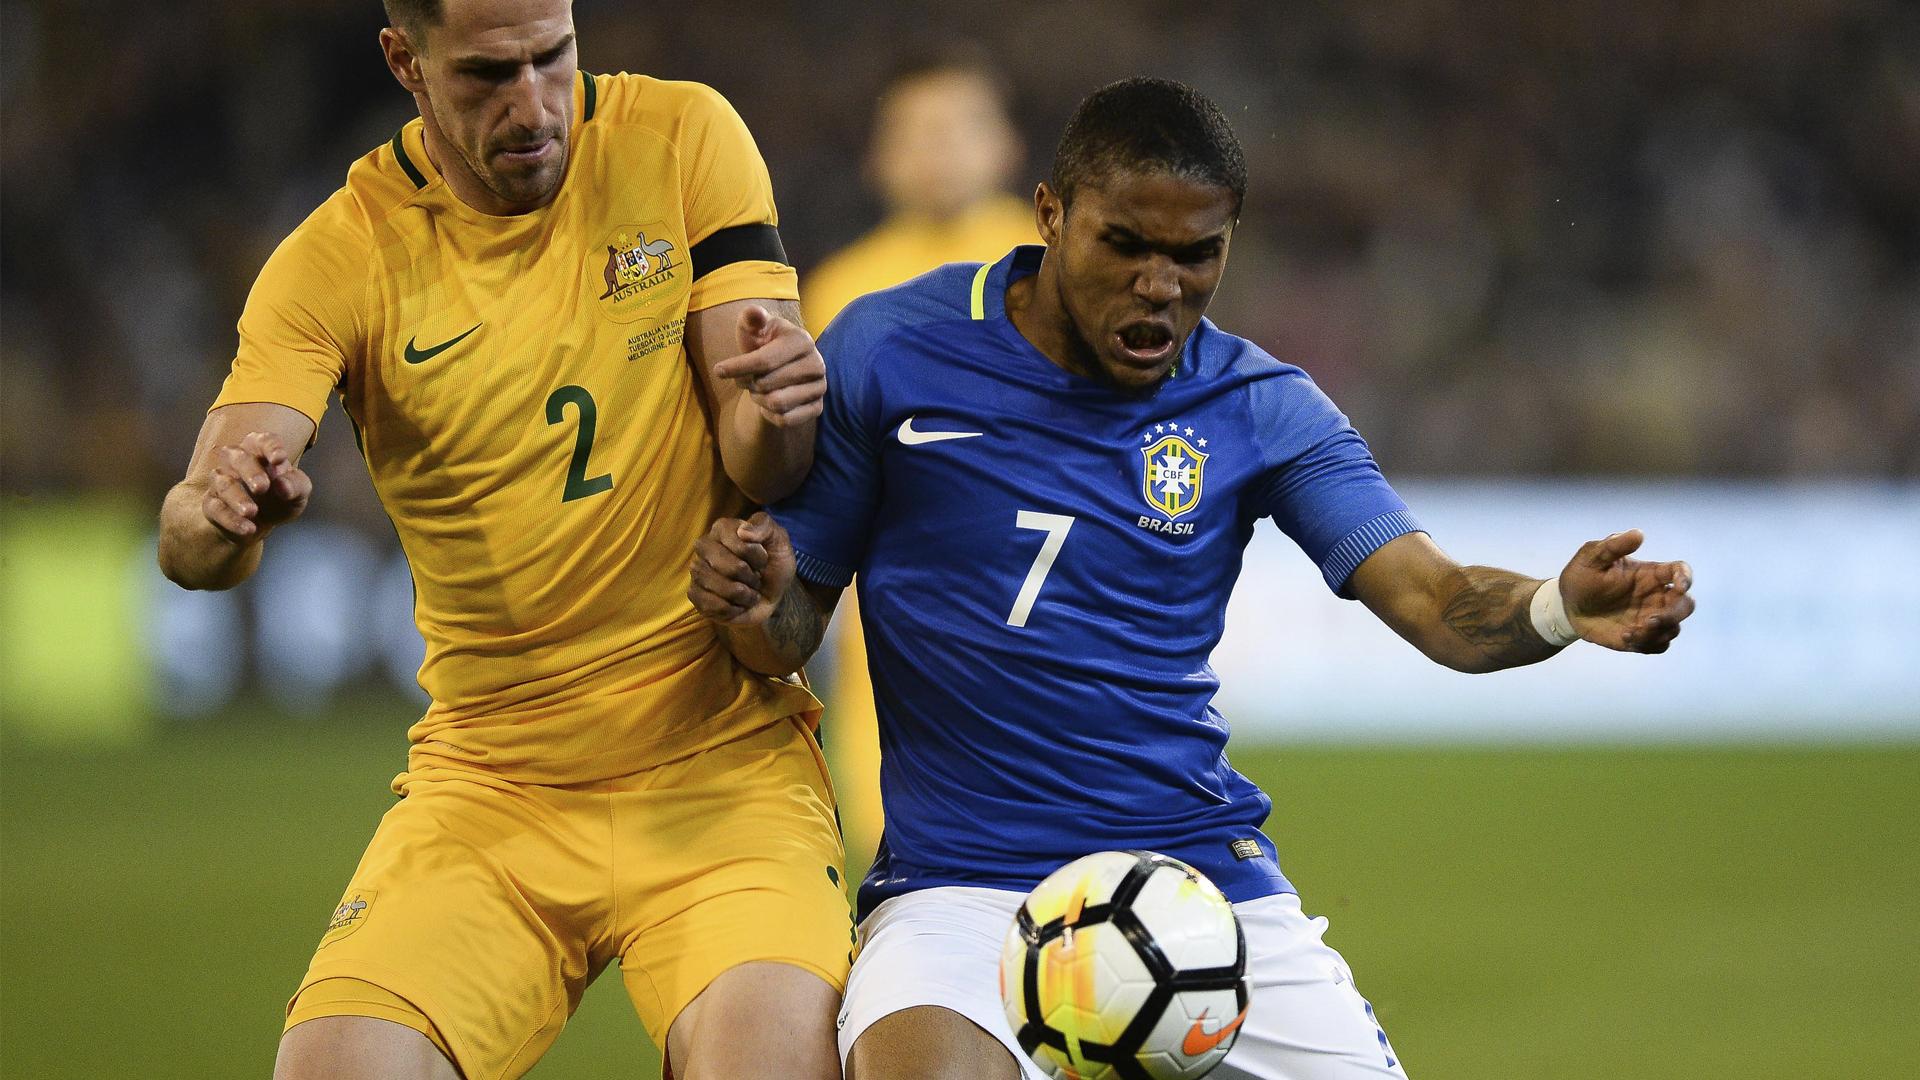 Douglas Costa Brasil x Austrália  13 06 17